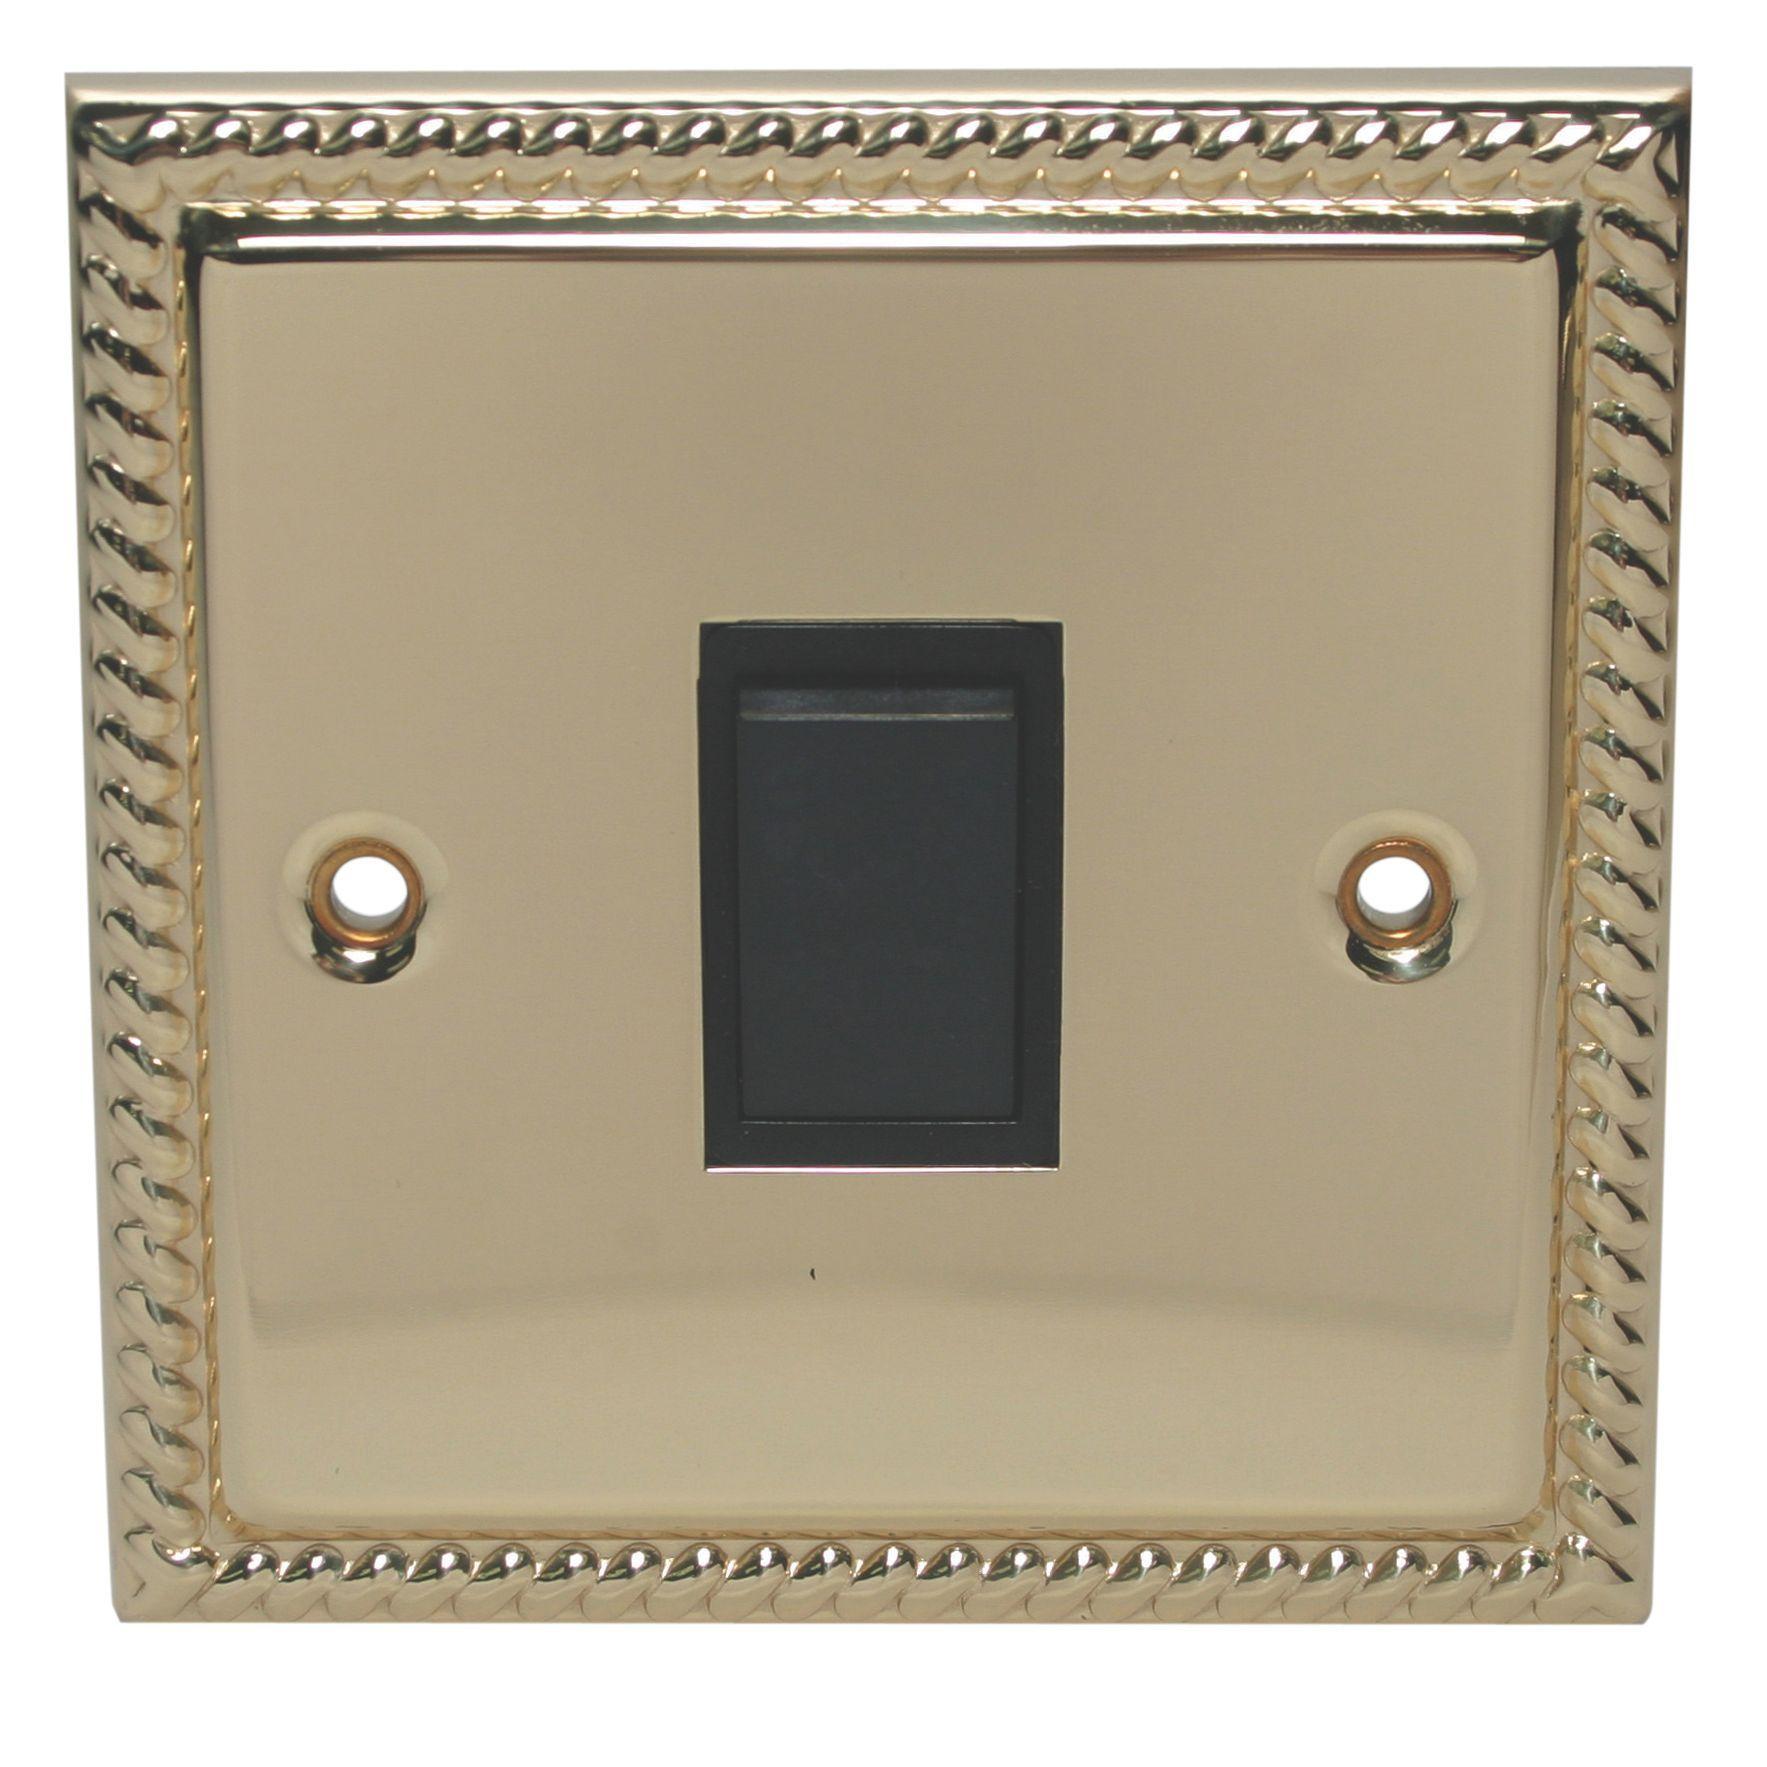 Holder 10a 2-way Single Polished Brass & Gold Effect Light Switch